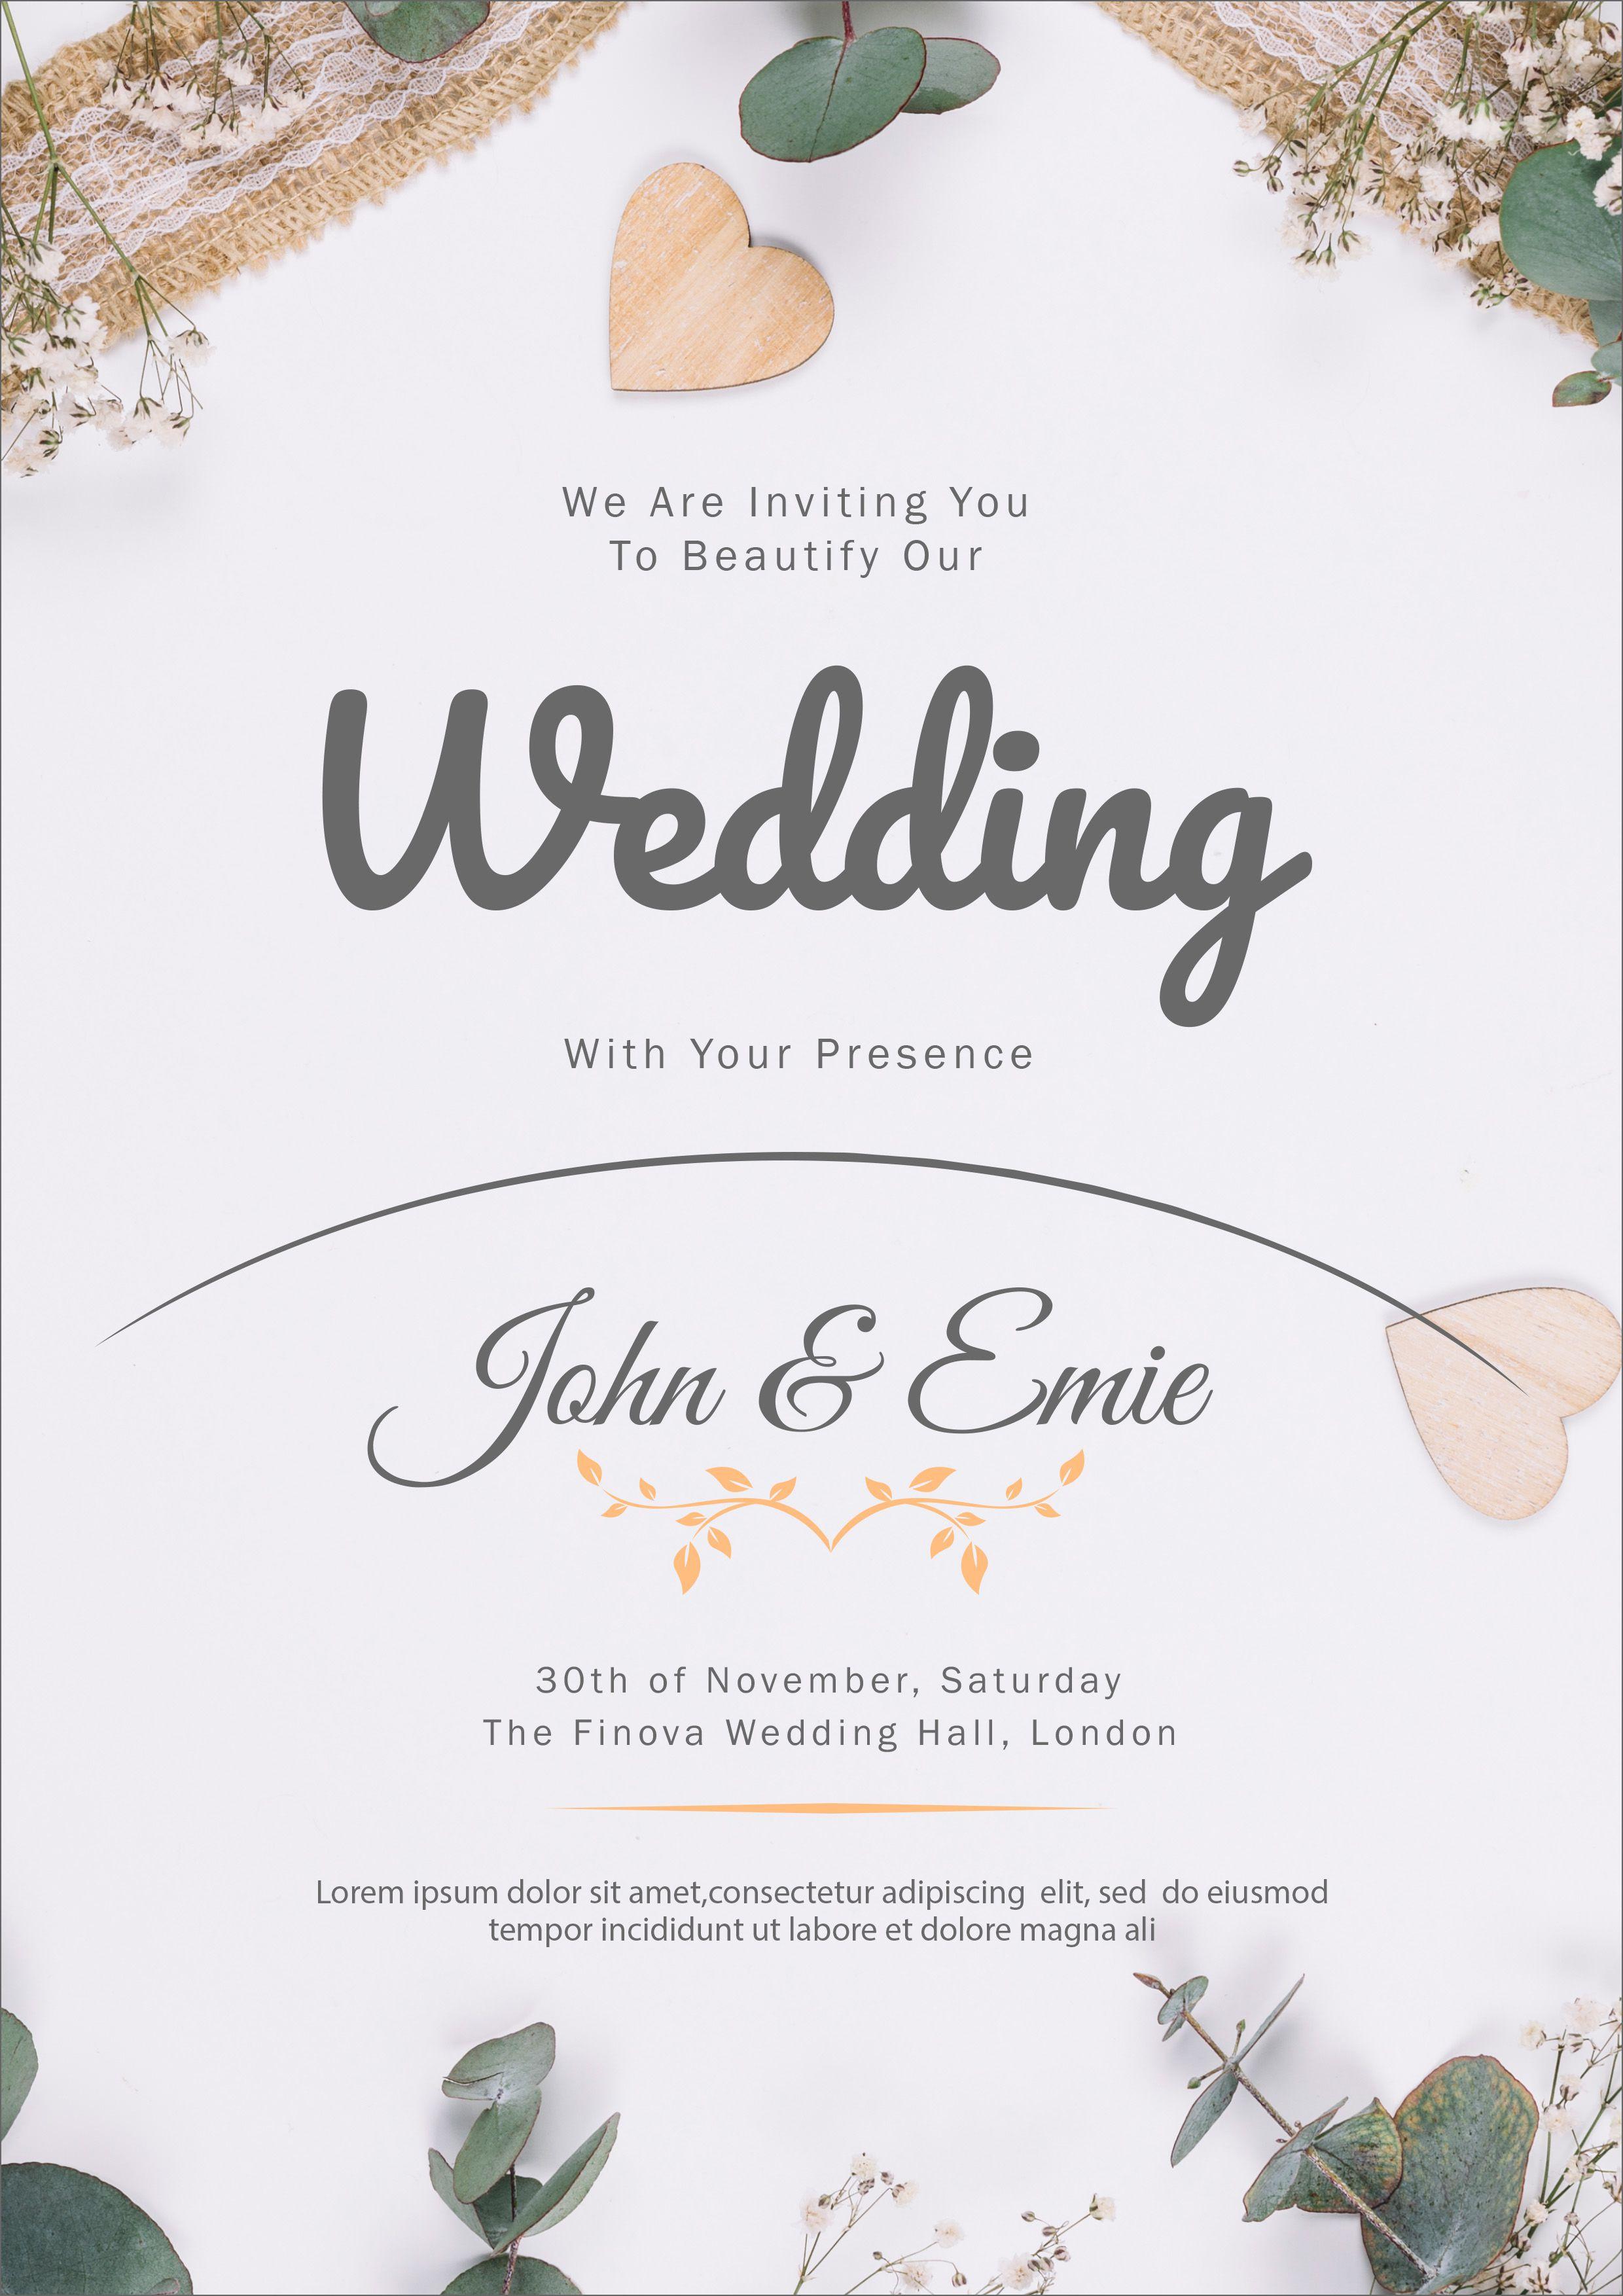 008 Magnificent Sample Wedding Invitation Card Template Photo  Templates Free Design Response WordingFull